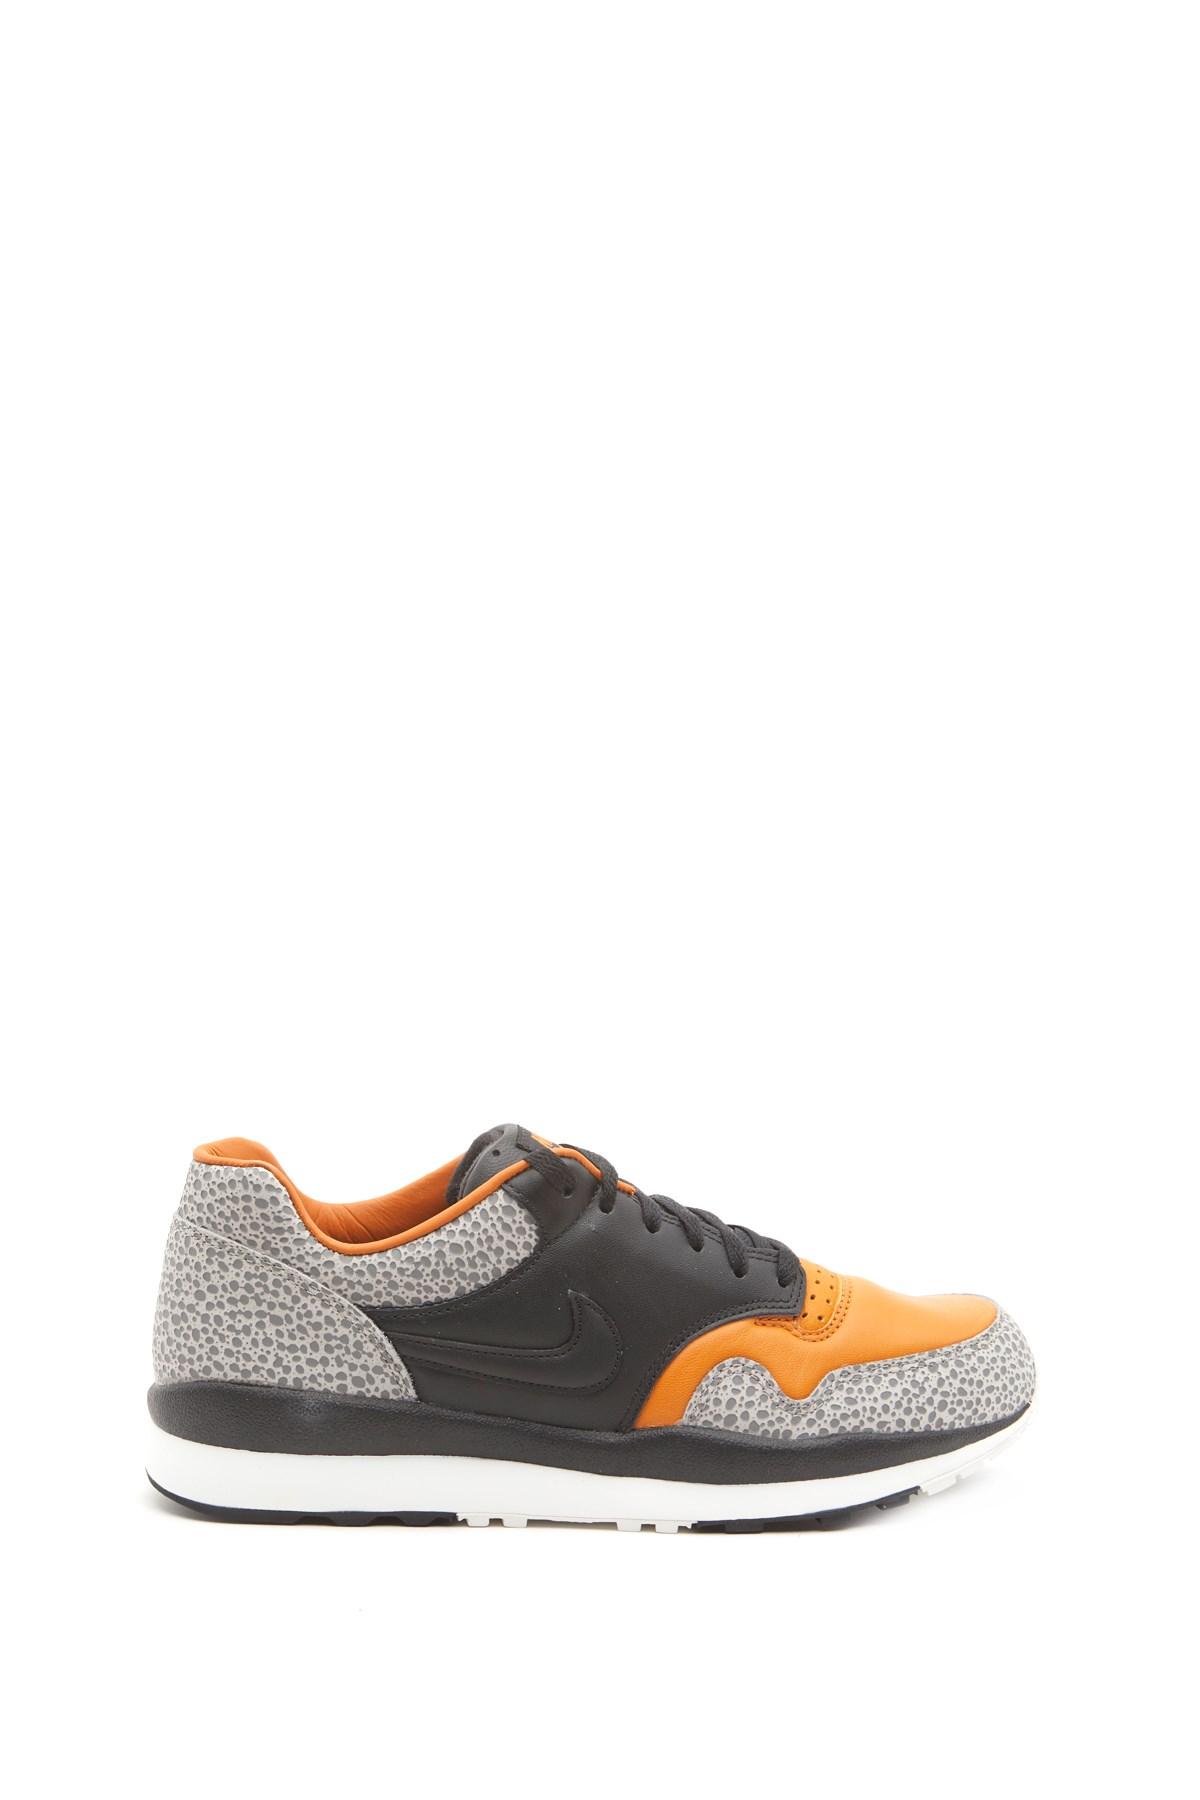 921c748baea3 nike  air safari qs  sneakers available on julian-fashion.com - 46329